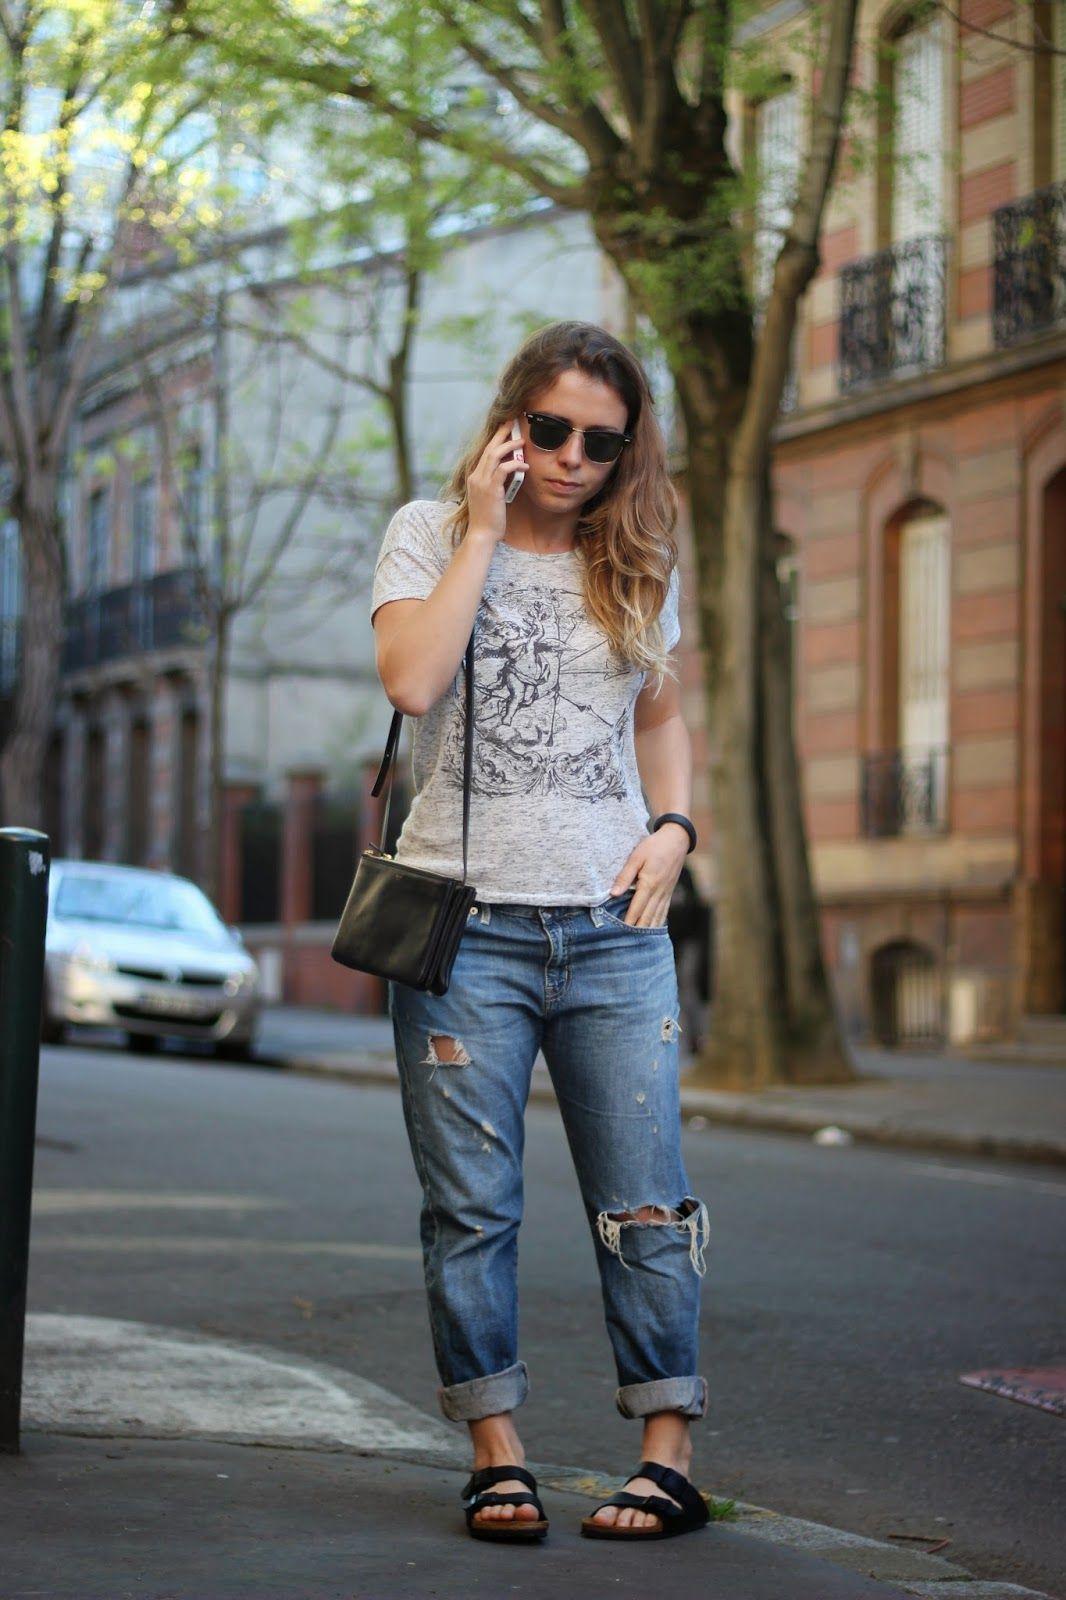 Le basique Birk' #birkenstock #outfit | Fashion••⊰ in 2019 ...